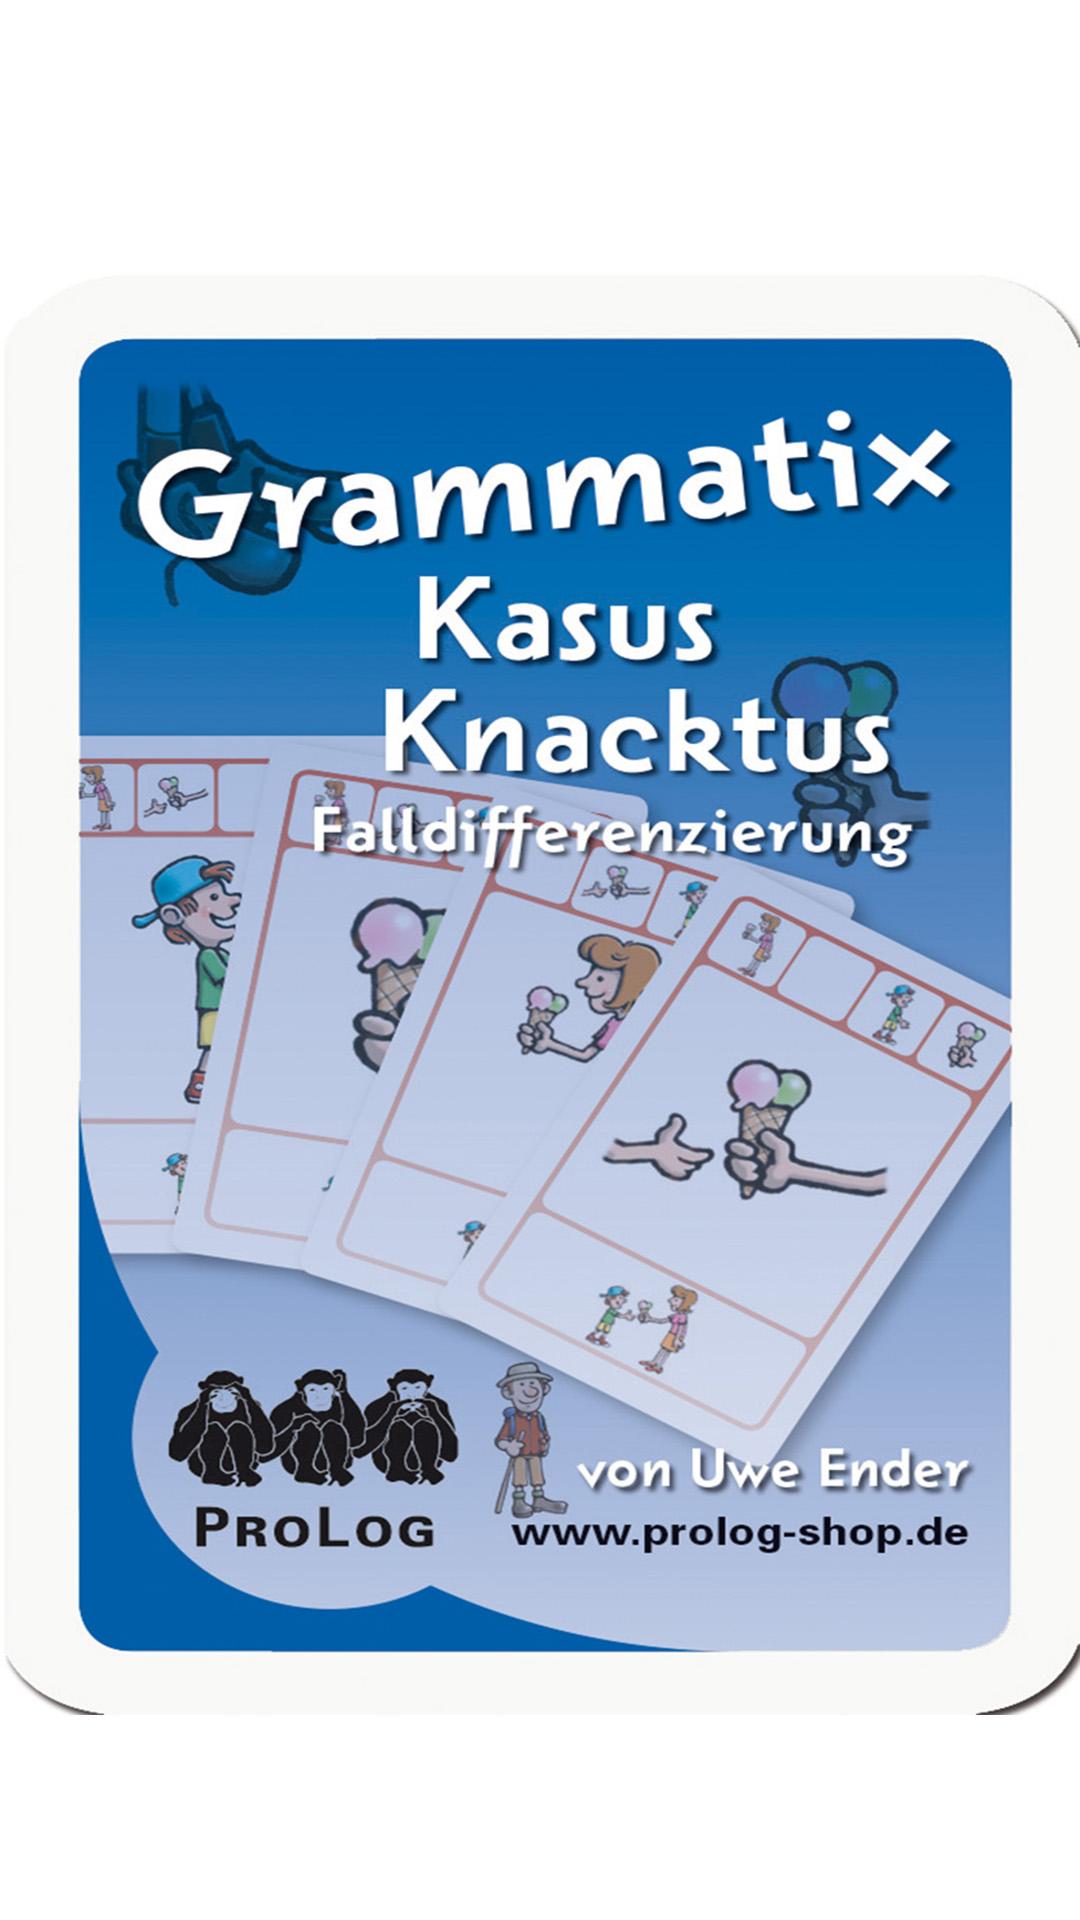 Gramatix Kasus Knactus